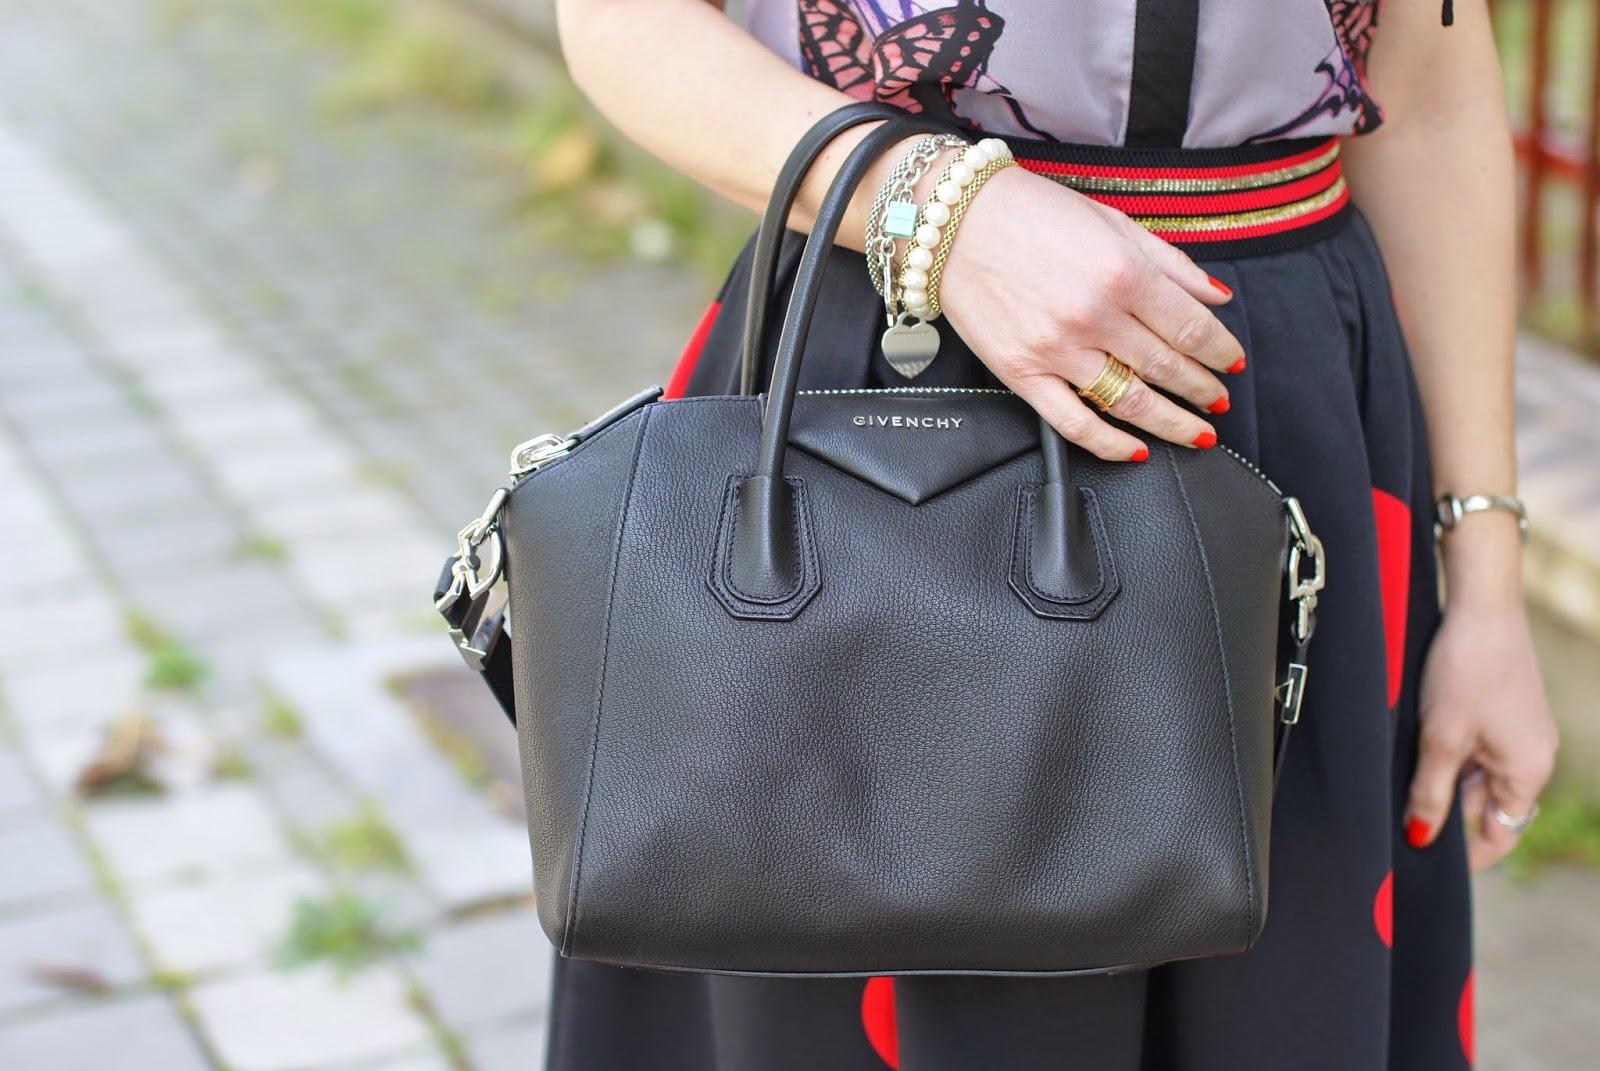 Givenchy Antigona small bag, Fashion and Cookies fashion blog, fashion blogger style